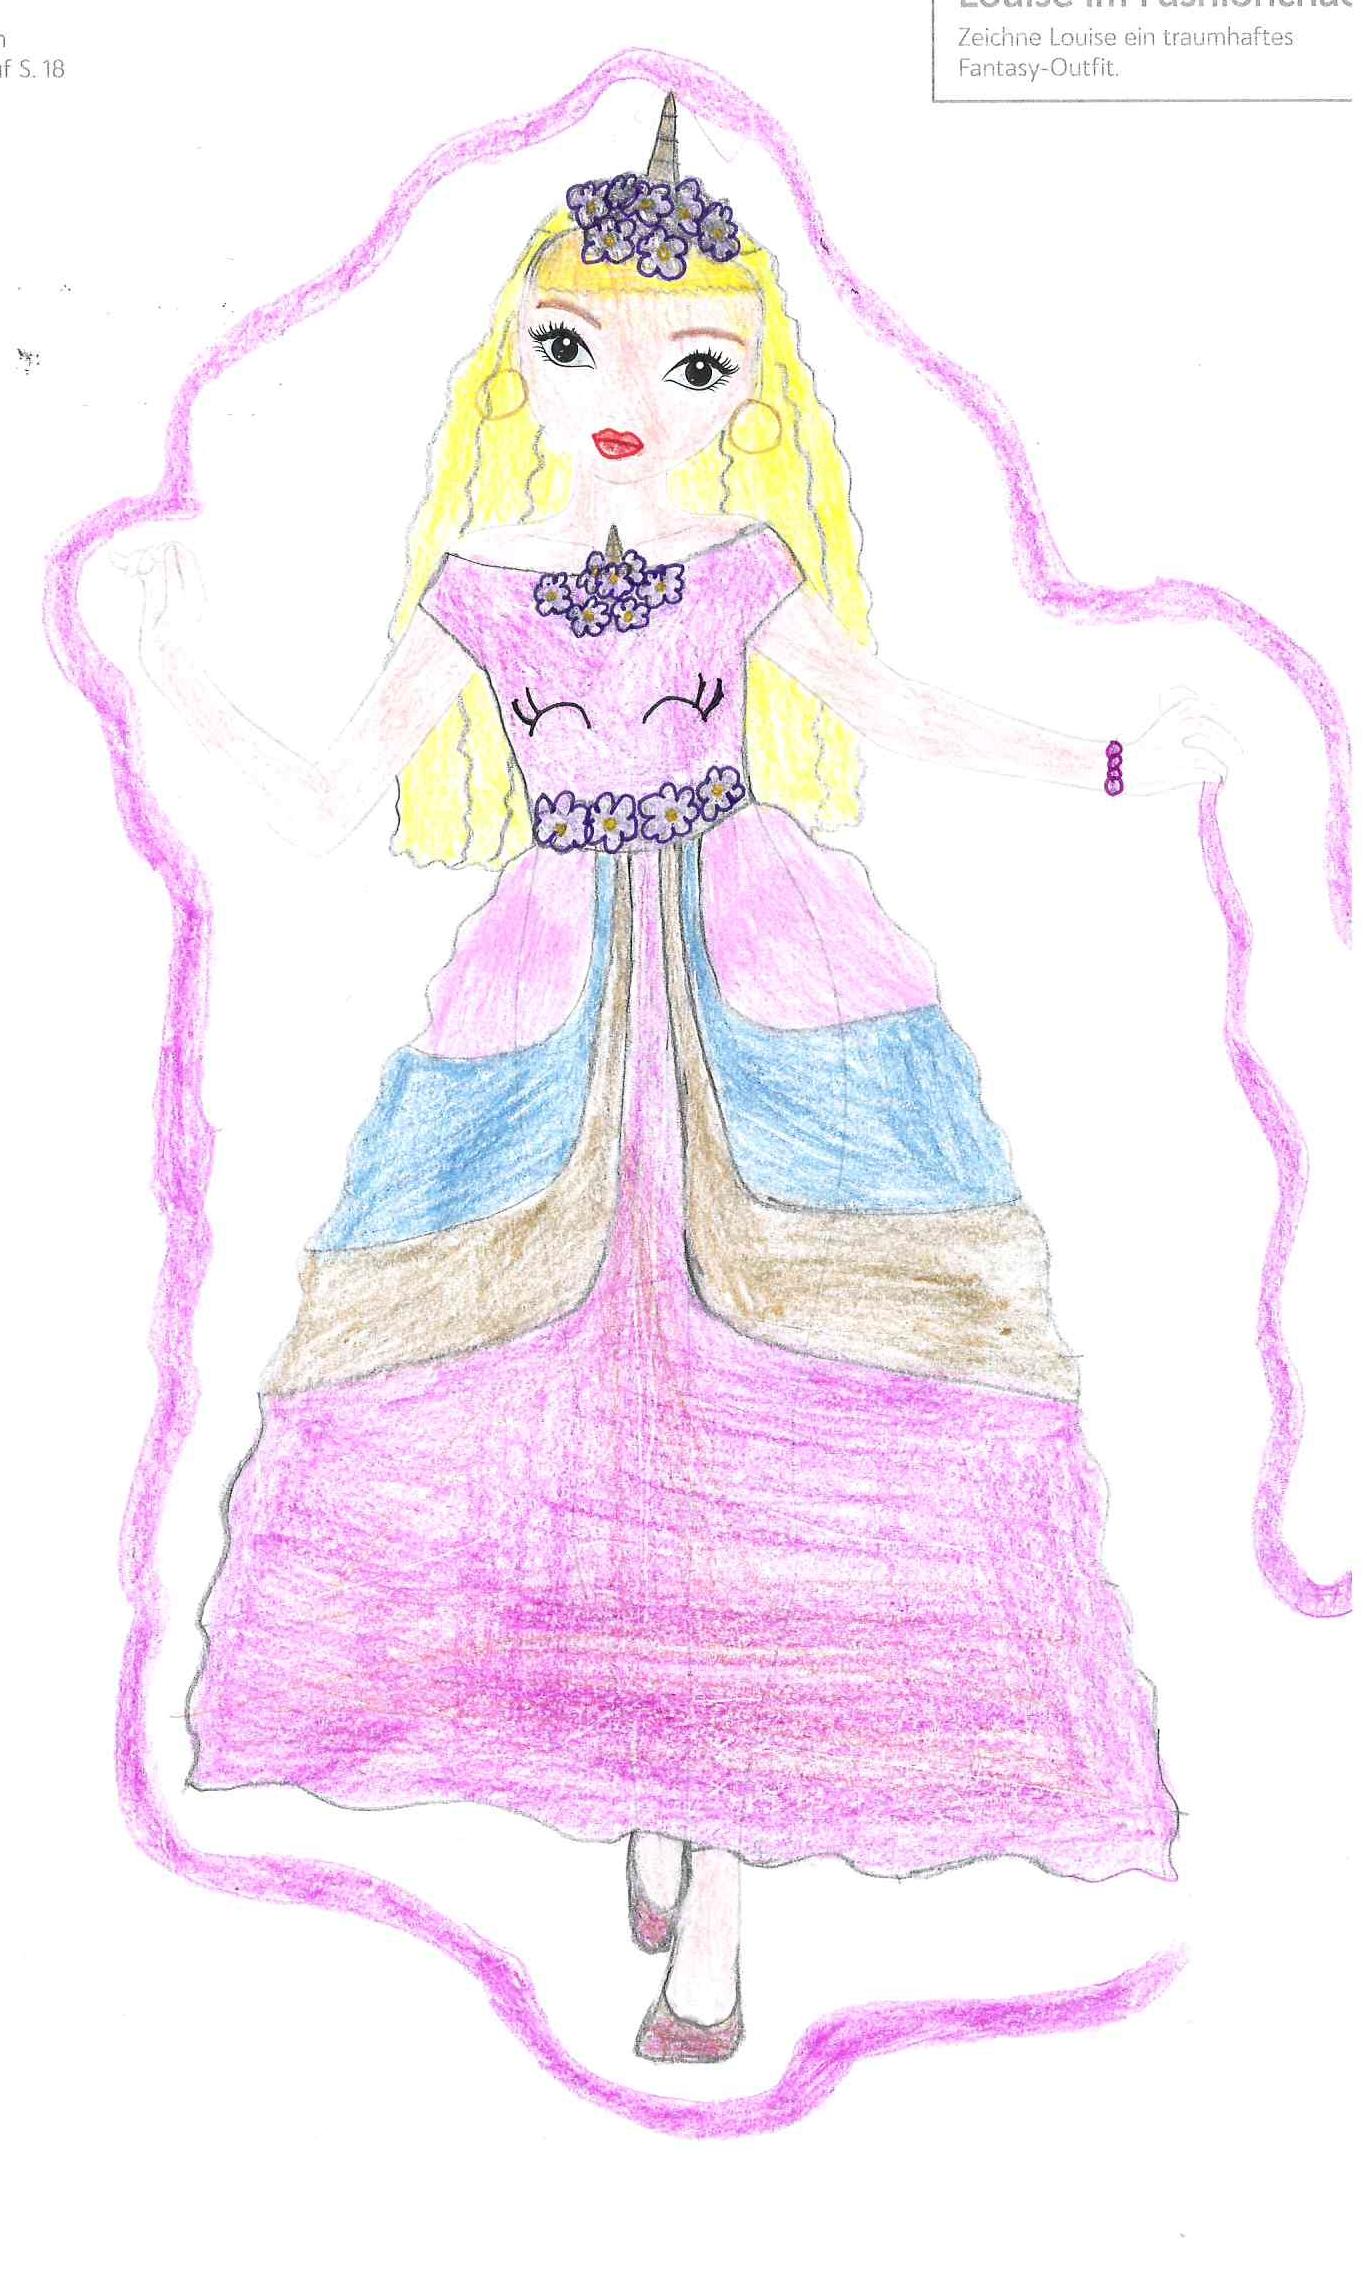 Alina E., 11 Jahre, aus Tyrlaching